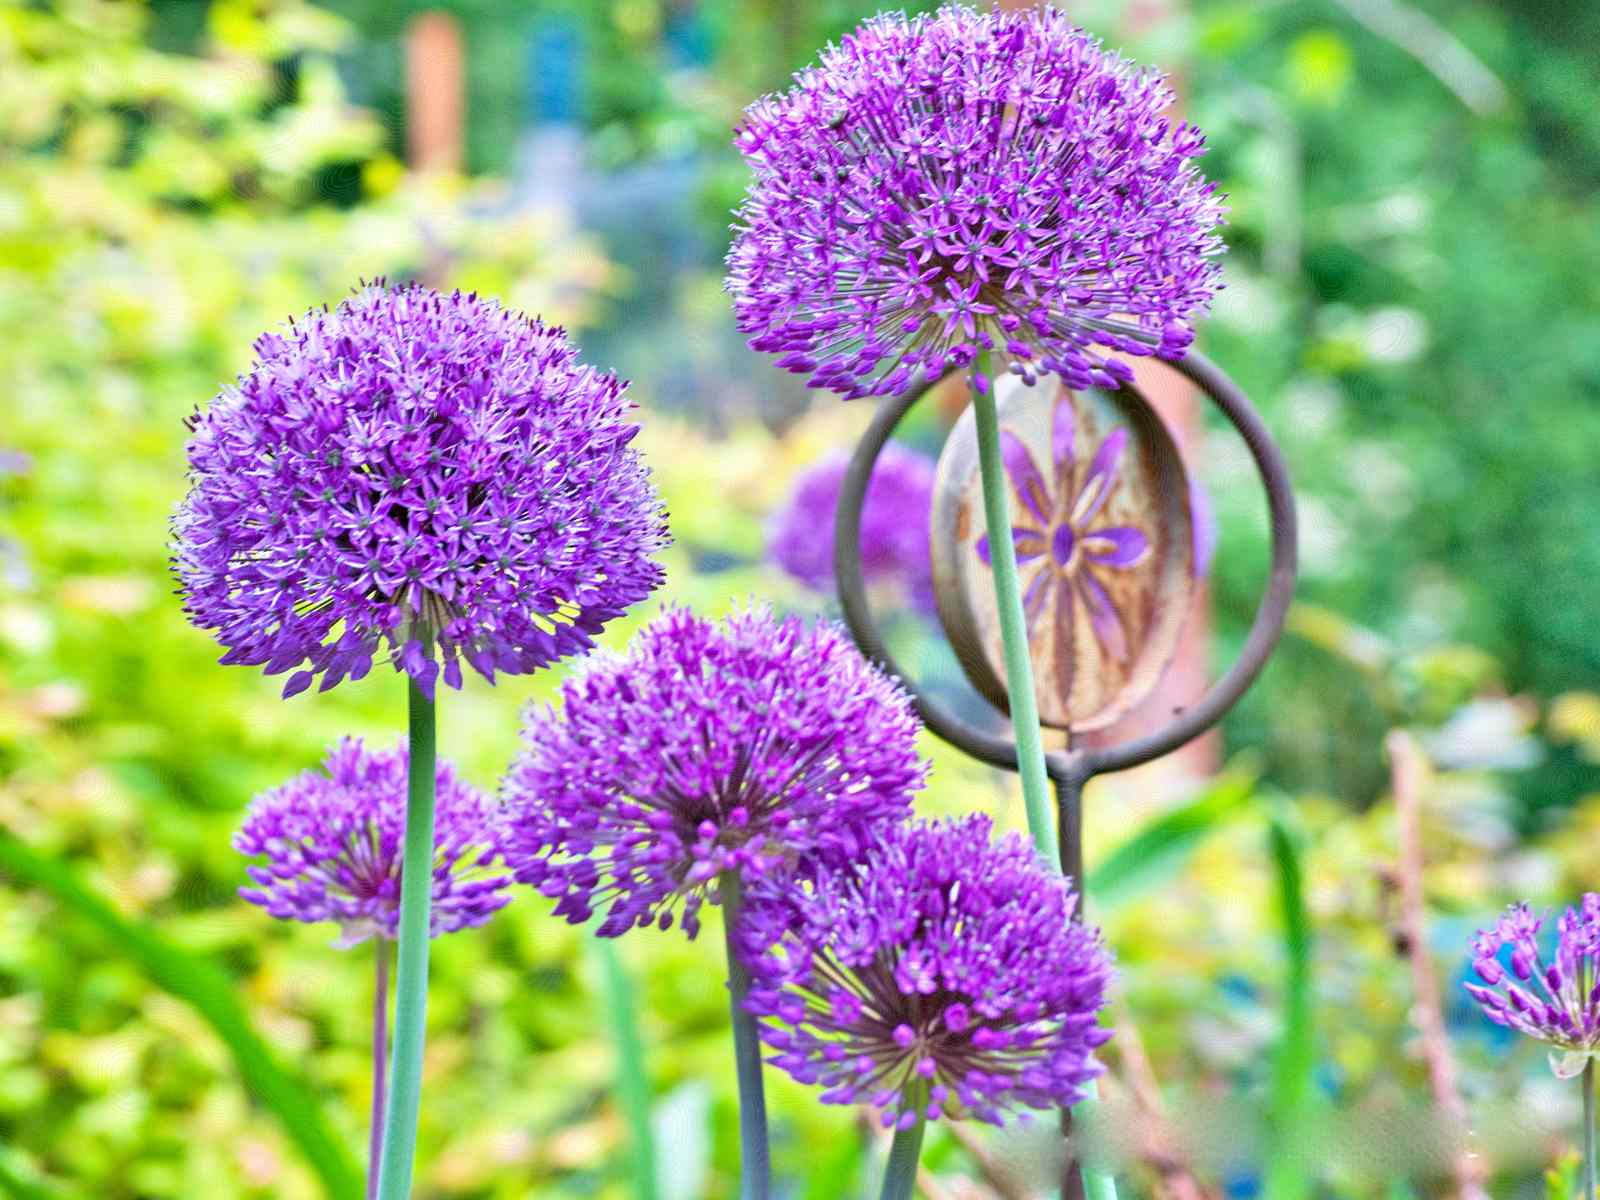 A closeup of some Allium